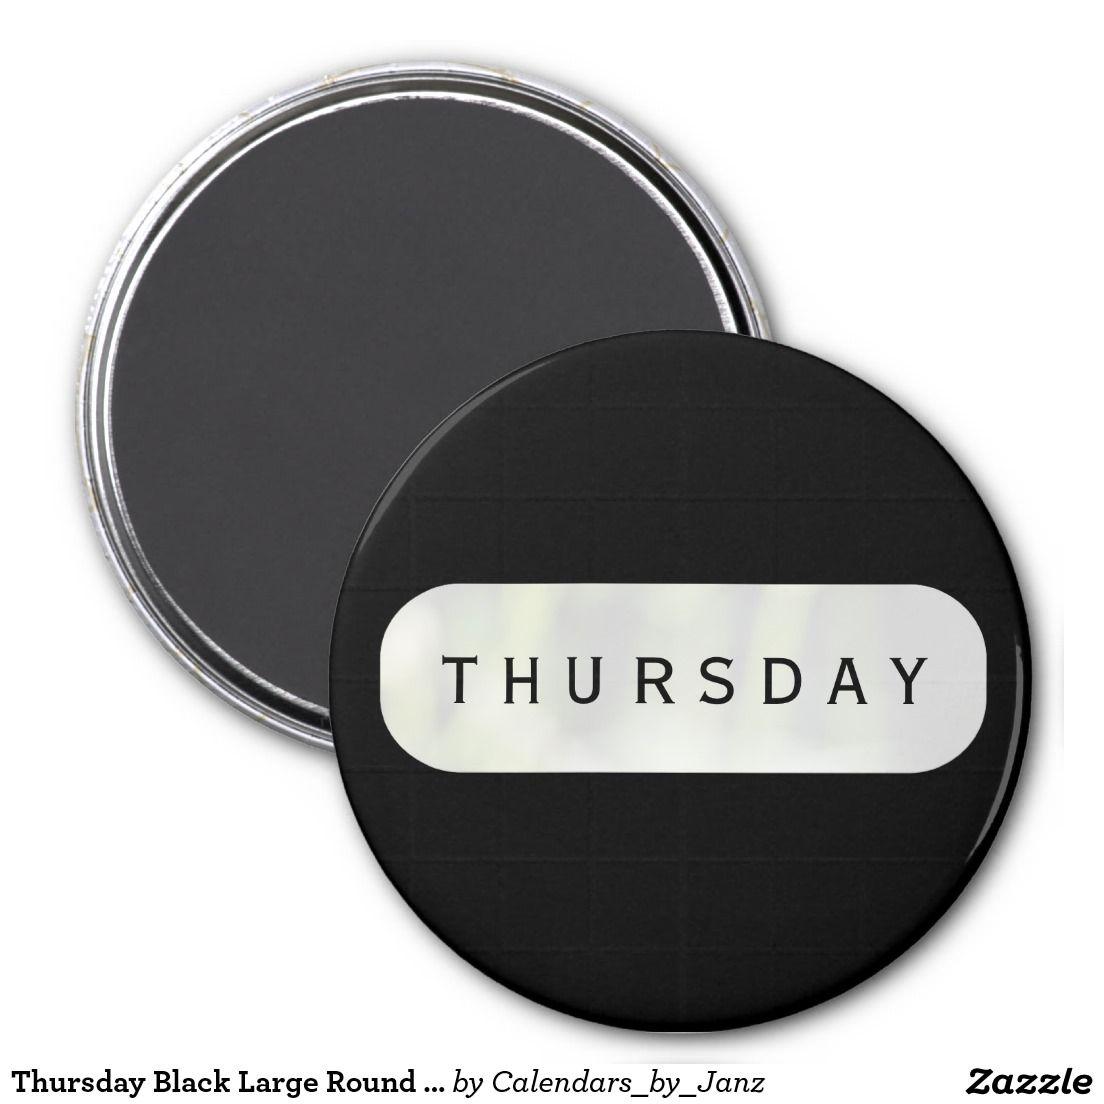 Thursday Black Large Round Magnet by Janz